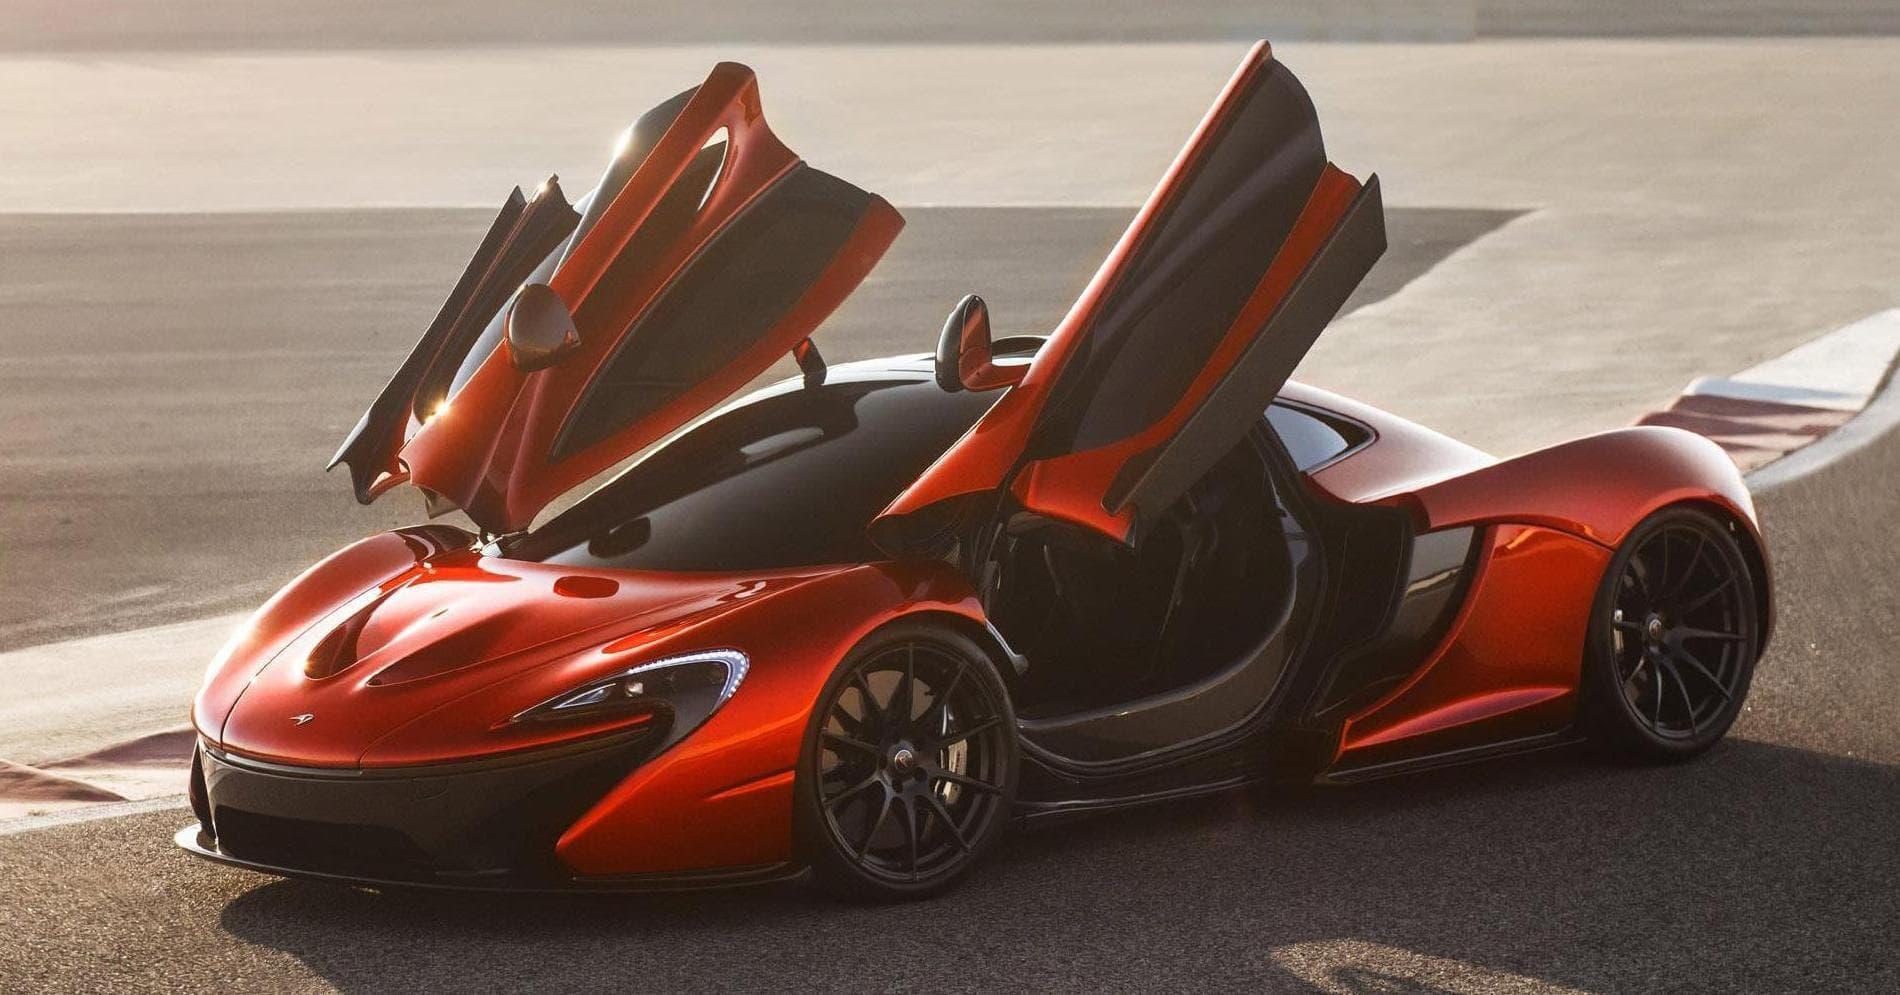 Best Cars With Lamborghini Doors List Of Scissor Doors Cars